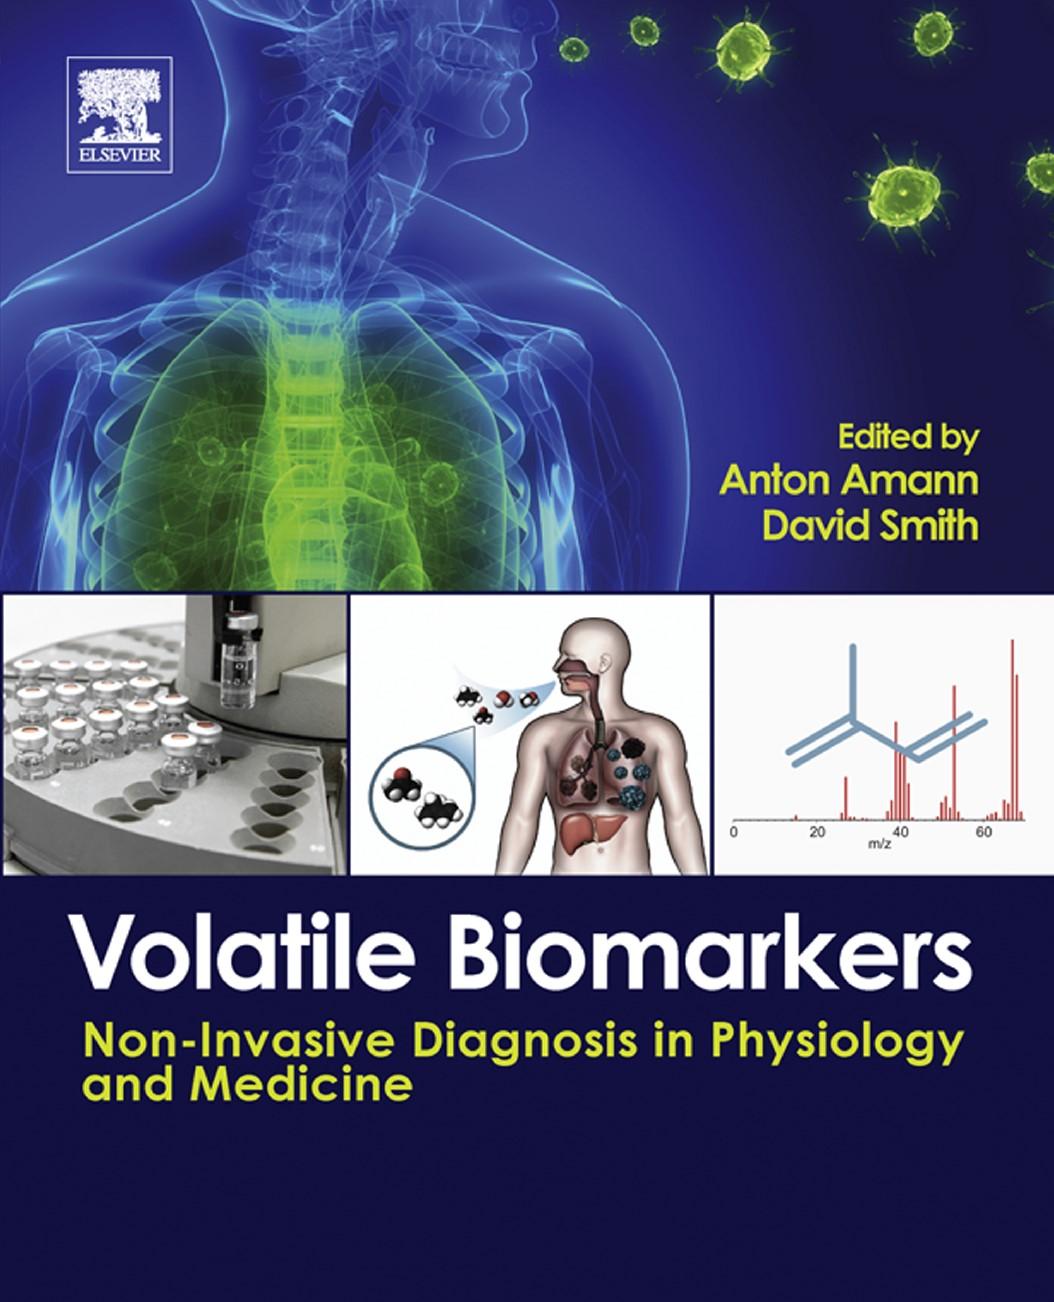 Volatile Biomarkers, 2013